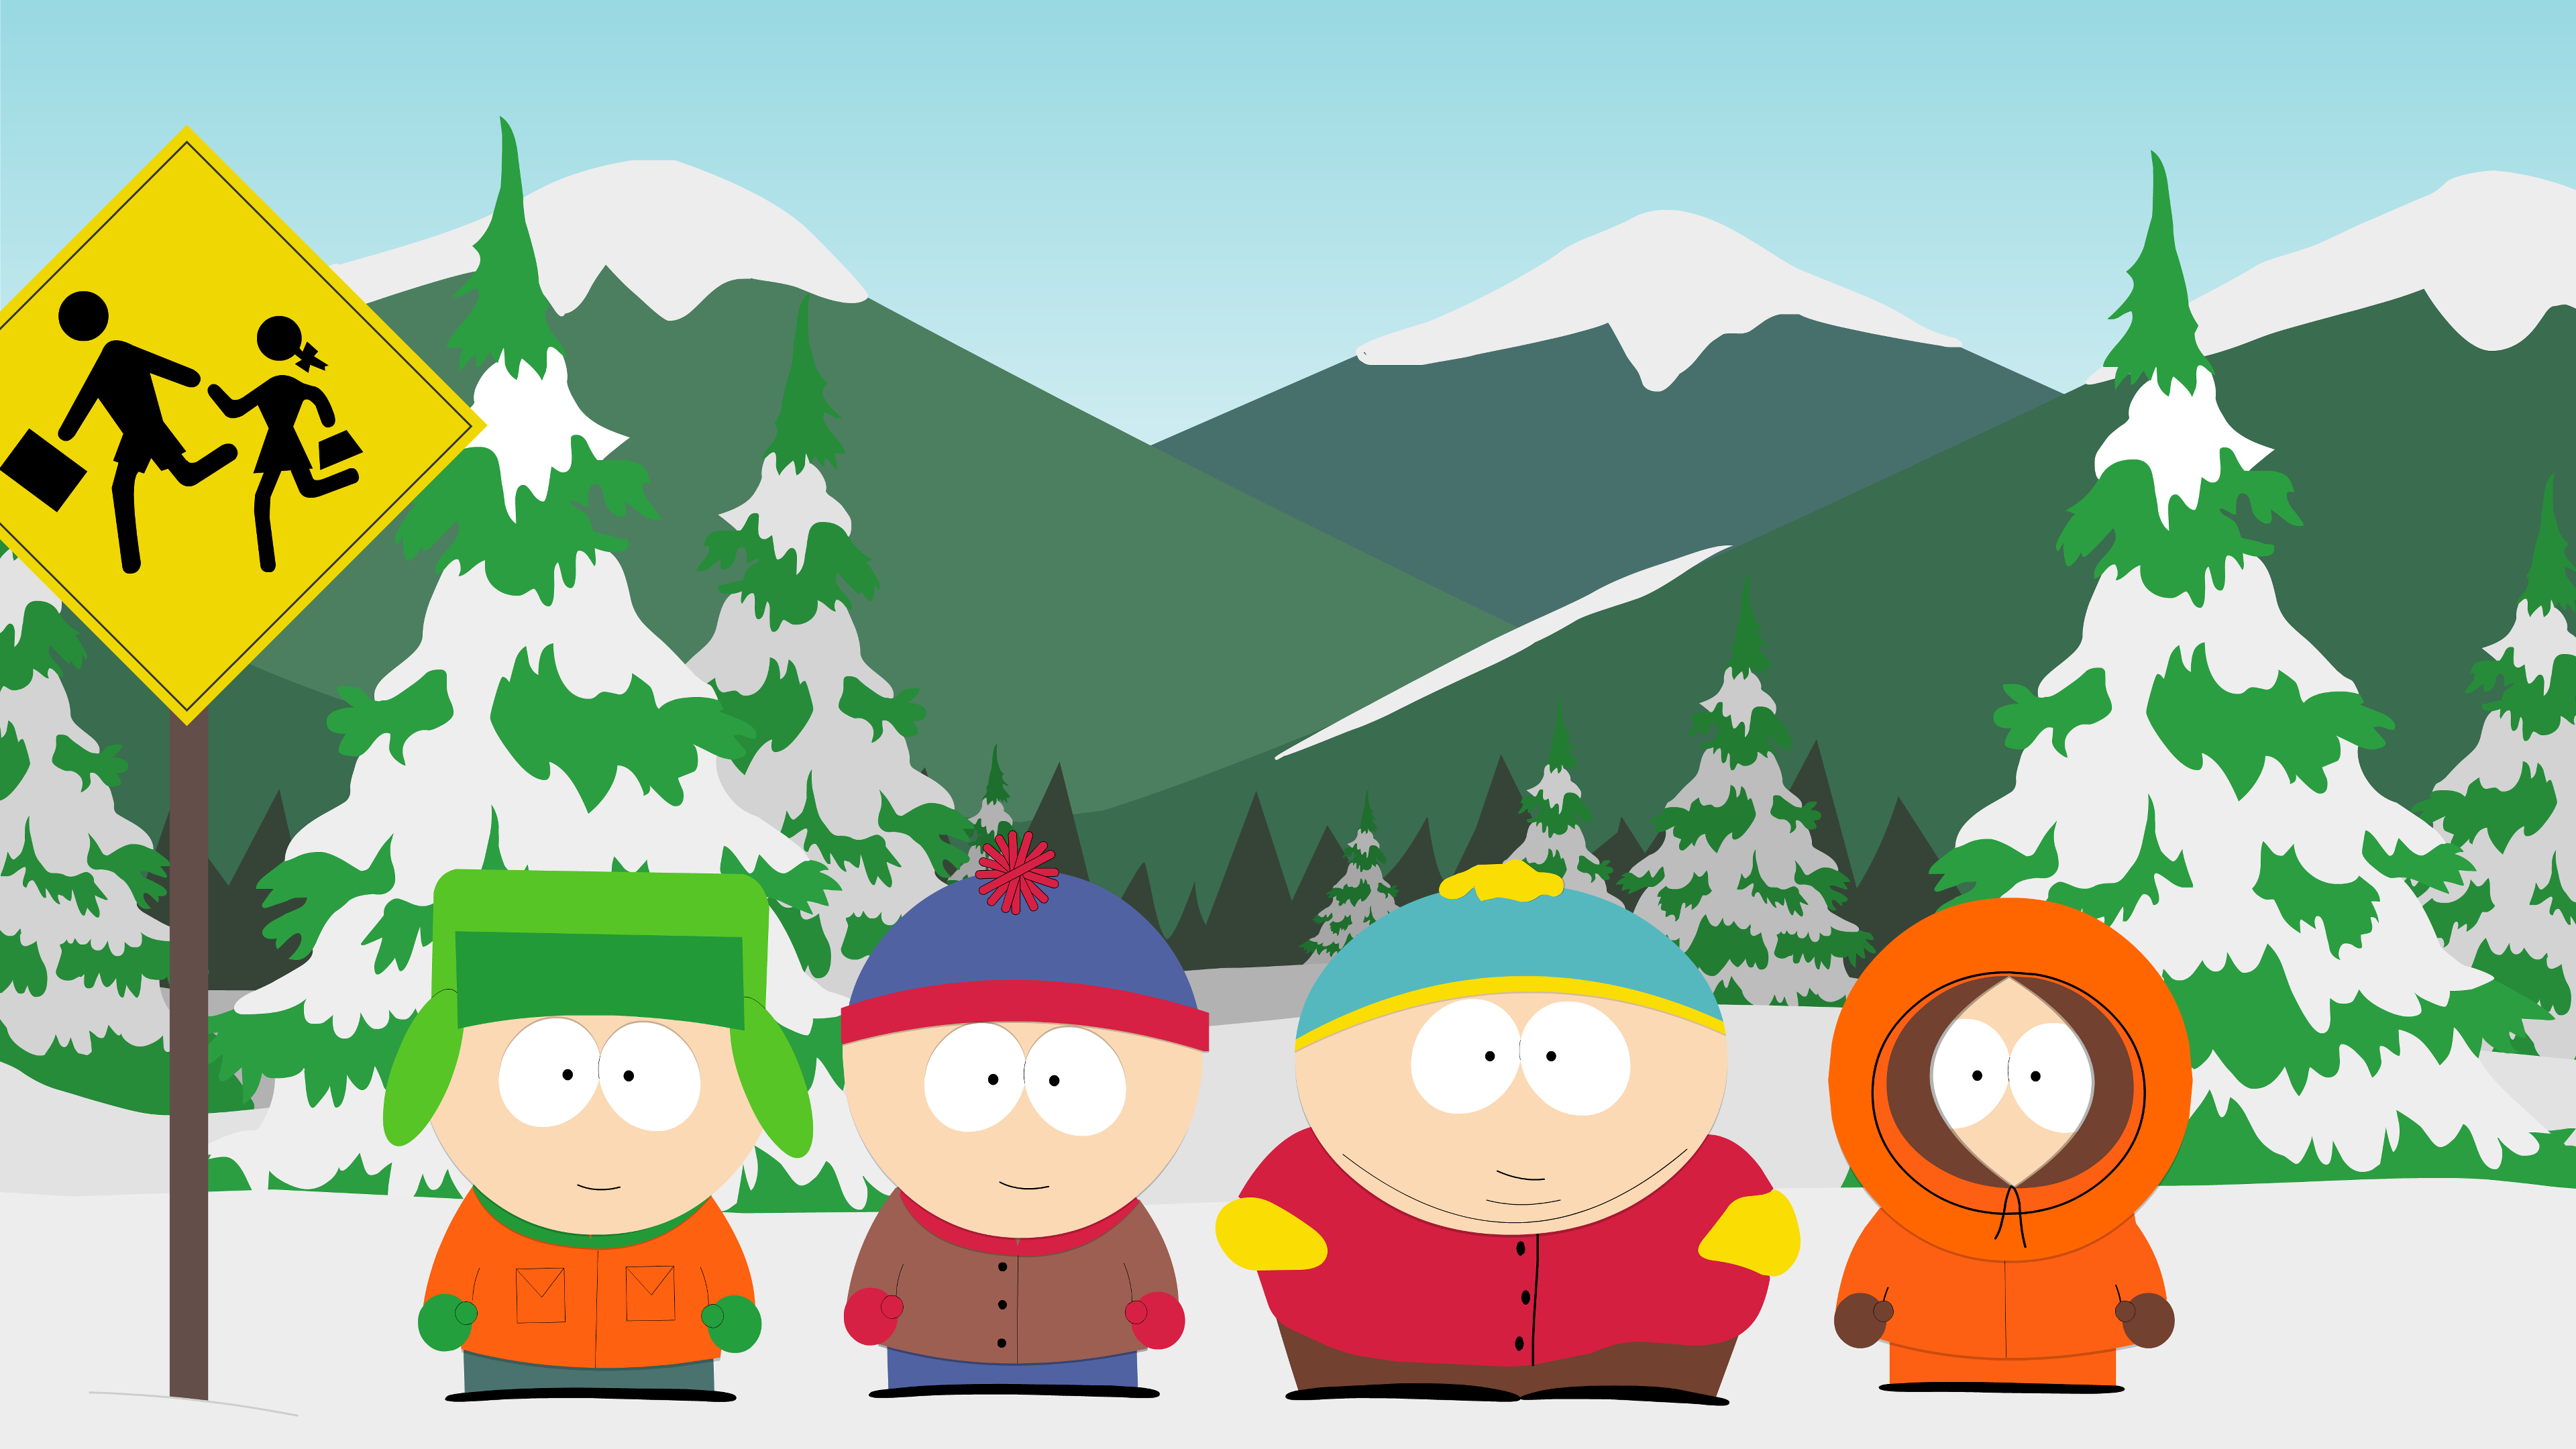 South Park Computer Wallpapers Desktop Backgrounds 3840x2160 ID 3840x2160